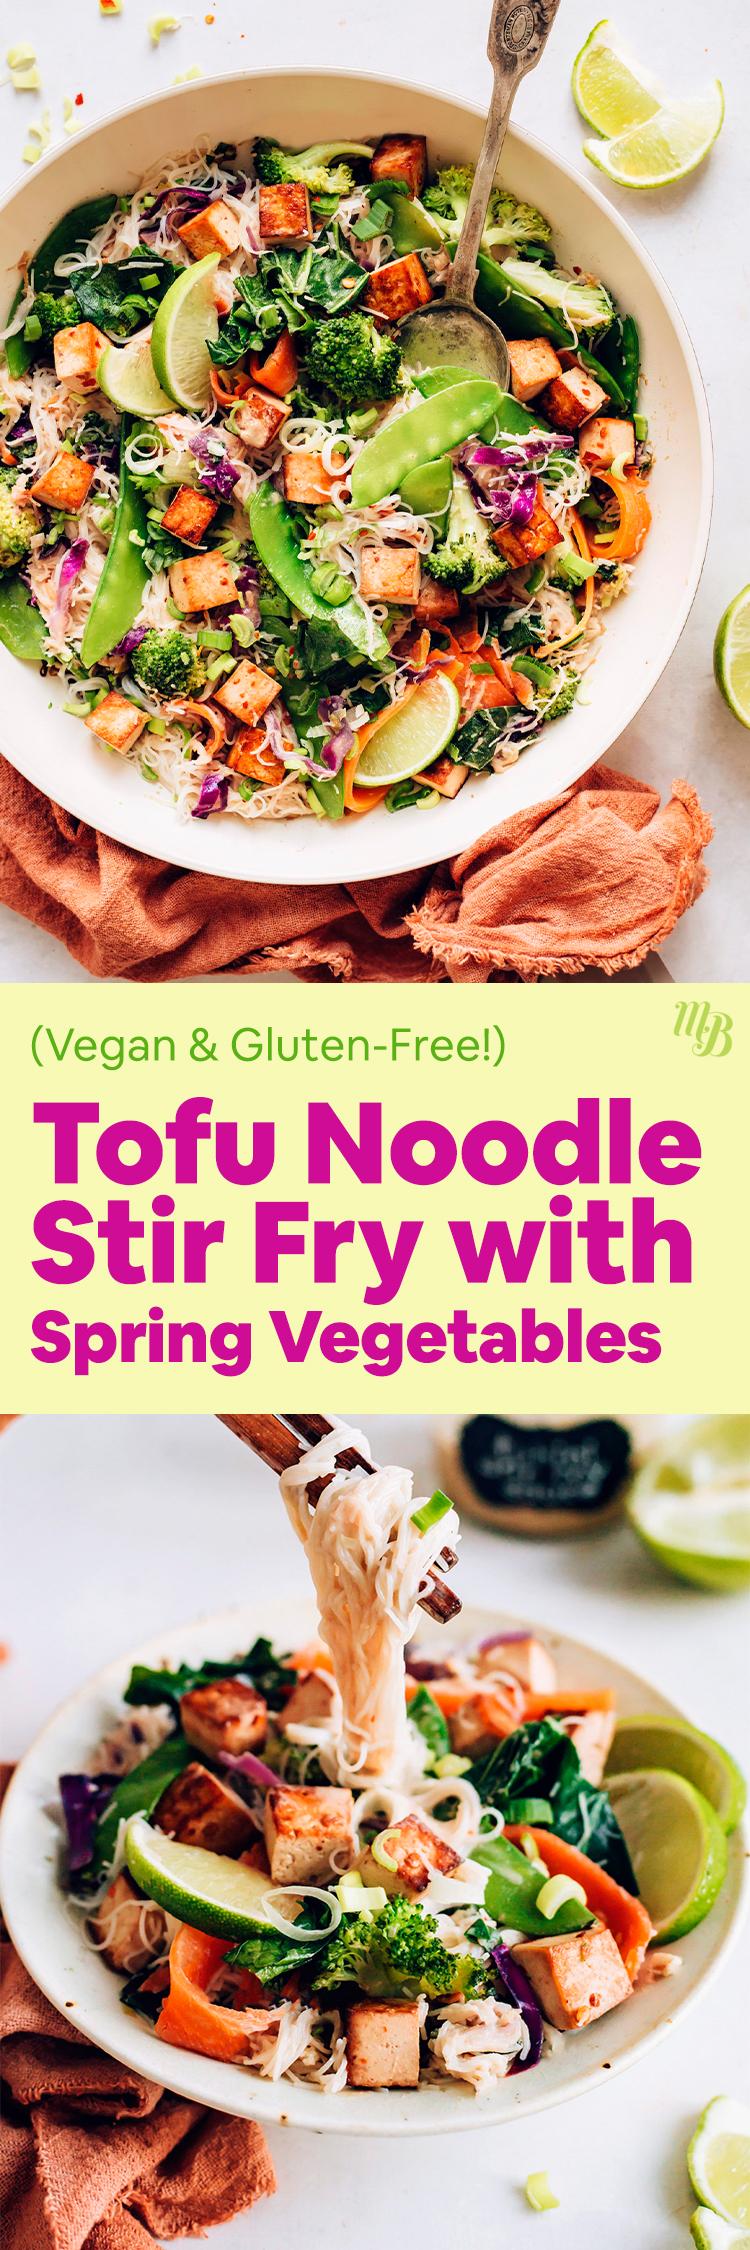 Tazones de fideos de tofu salteados con verduras de primavera y salsa tahini